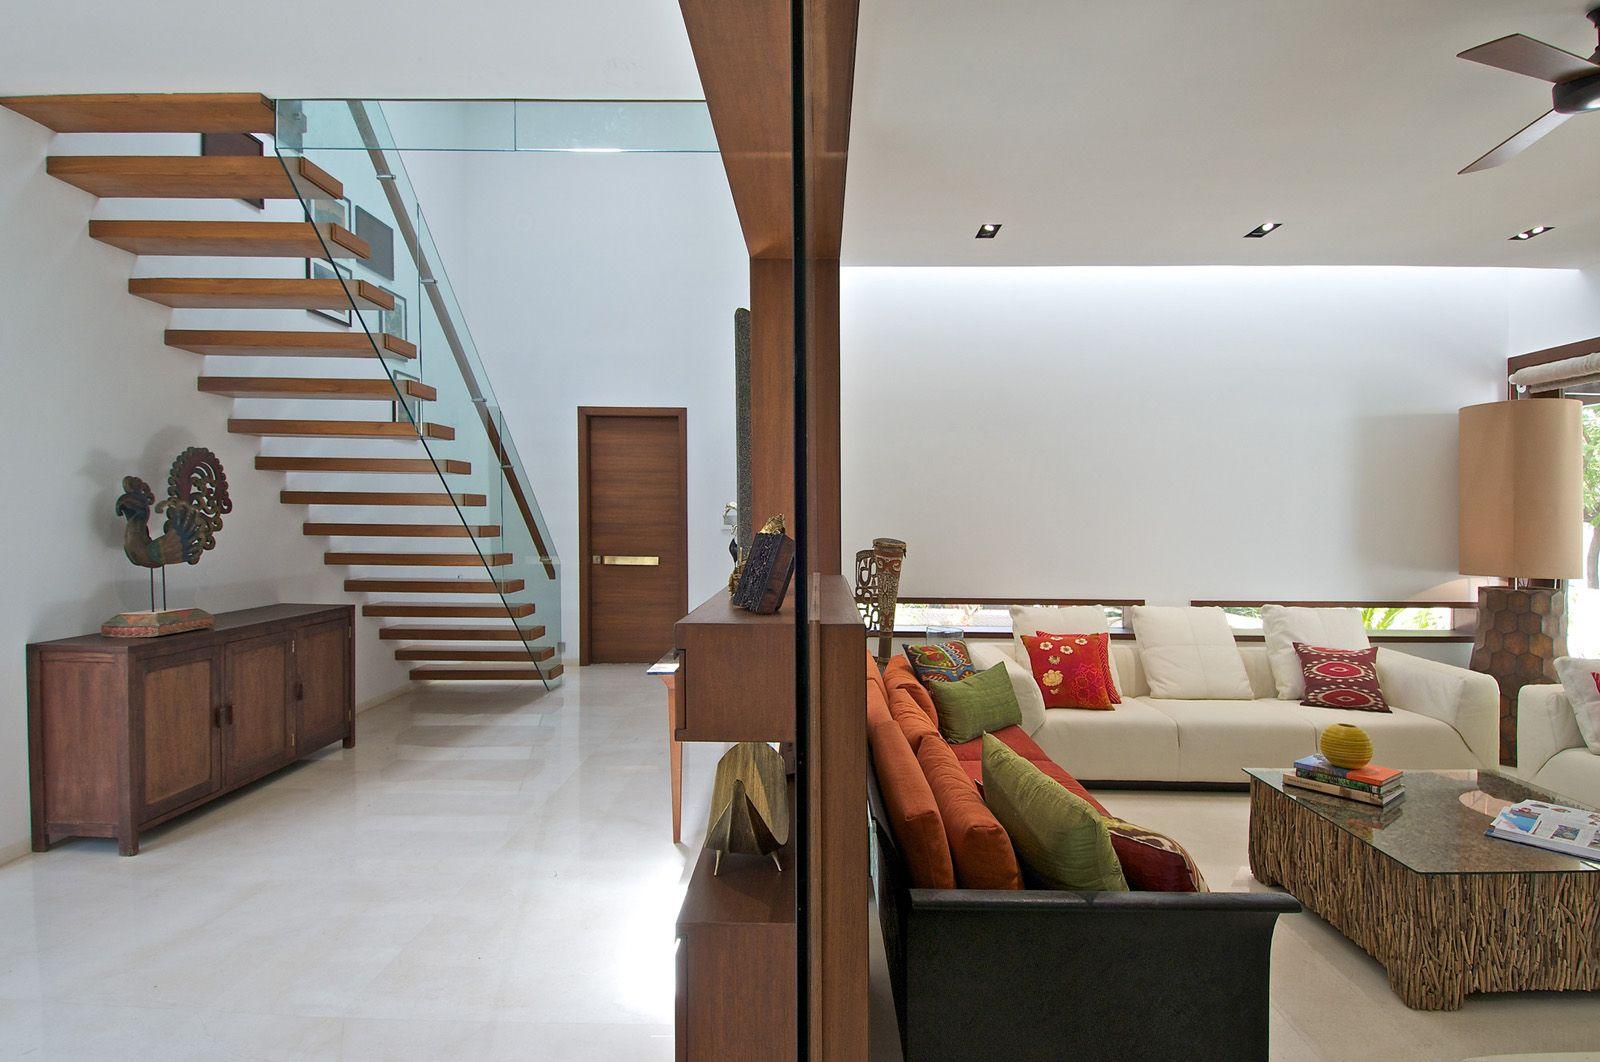 Timeless Contemporary House In India With Courtyard Zen Garden ...